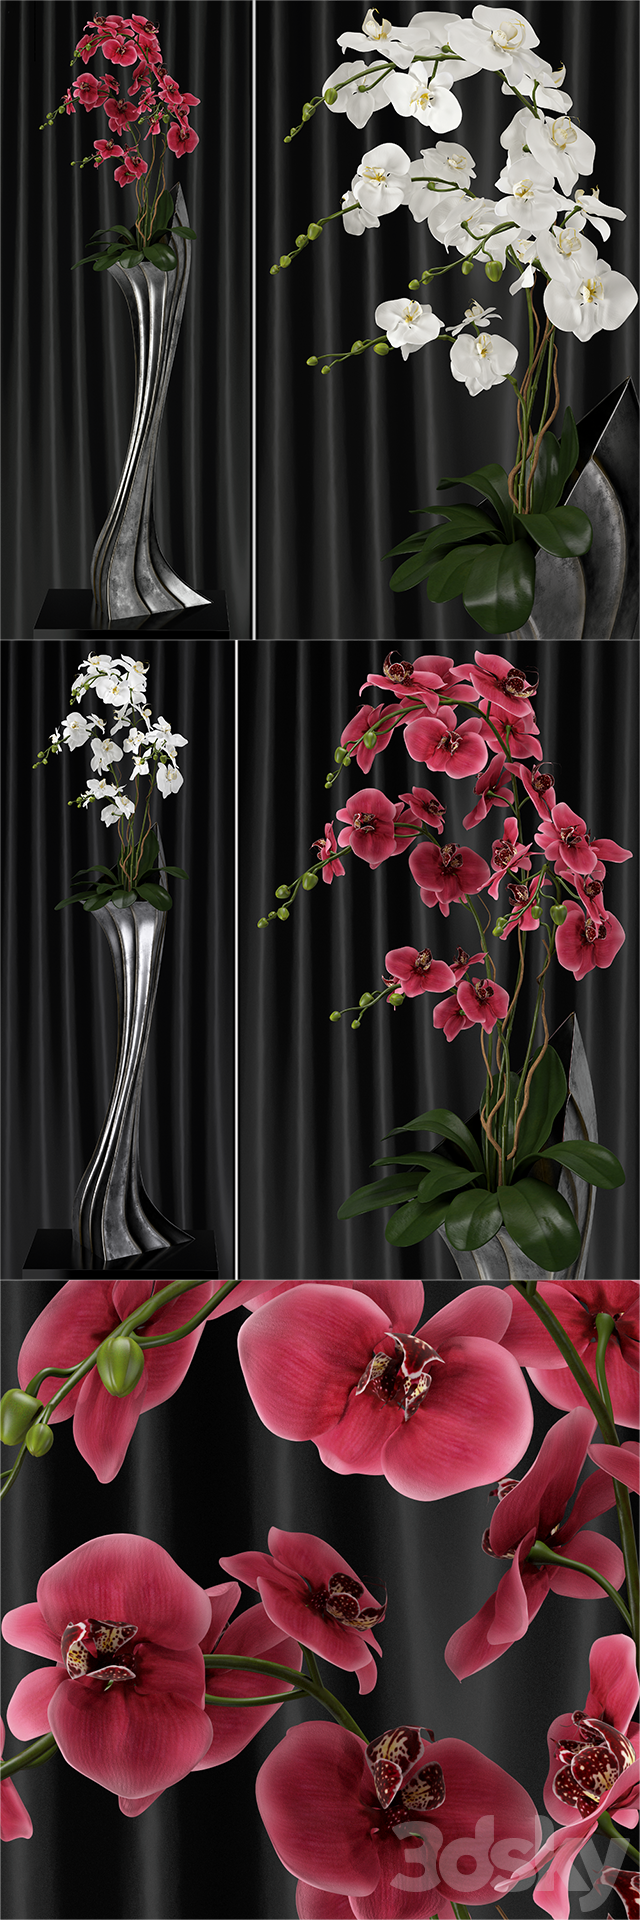 Orchid (phalaenopsis) bouquet 2